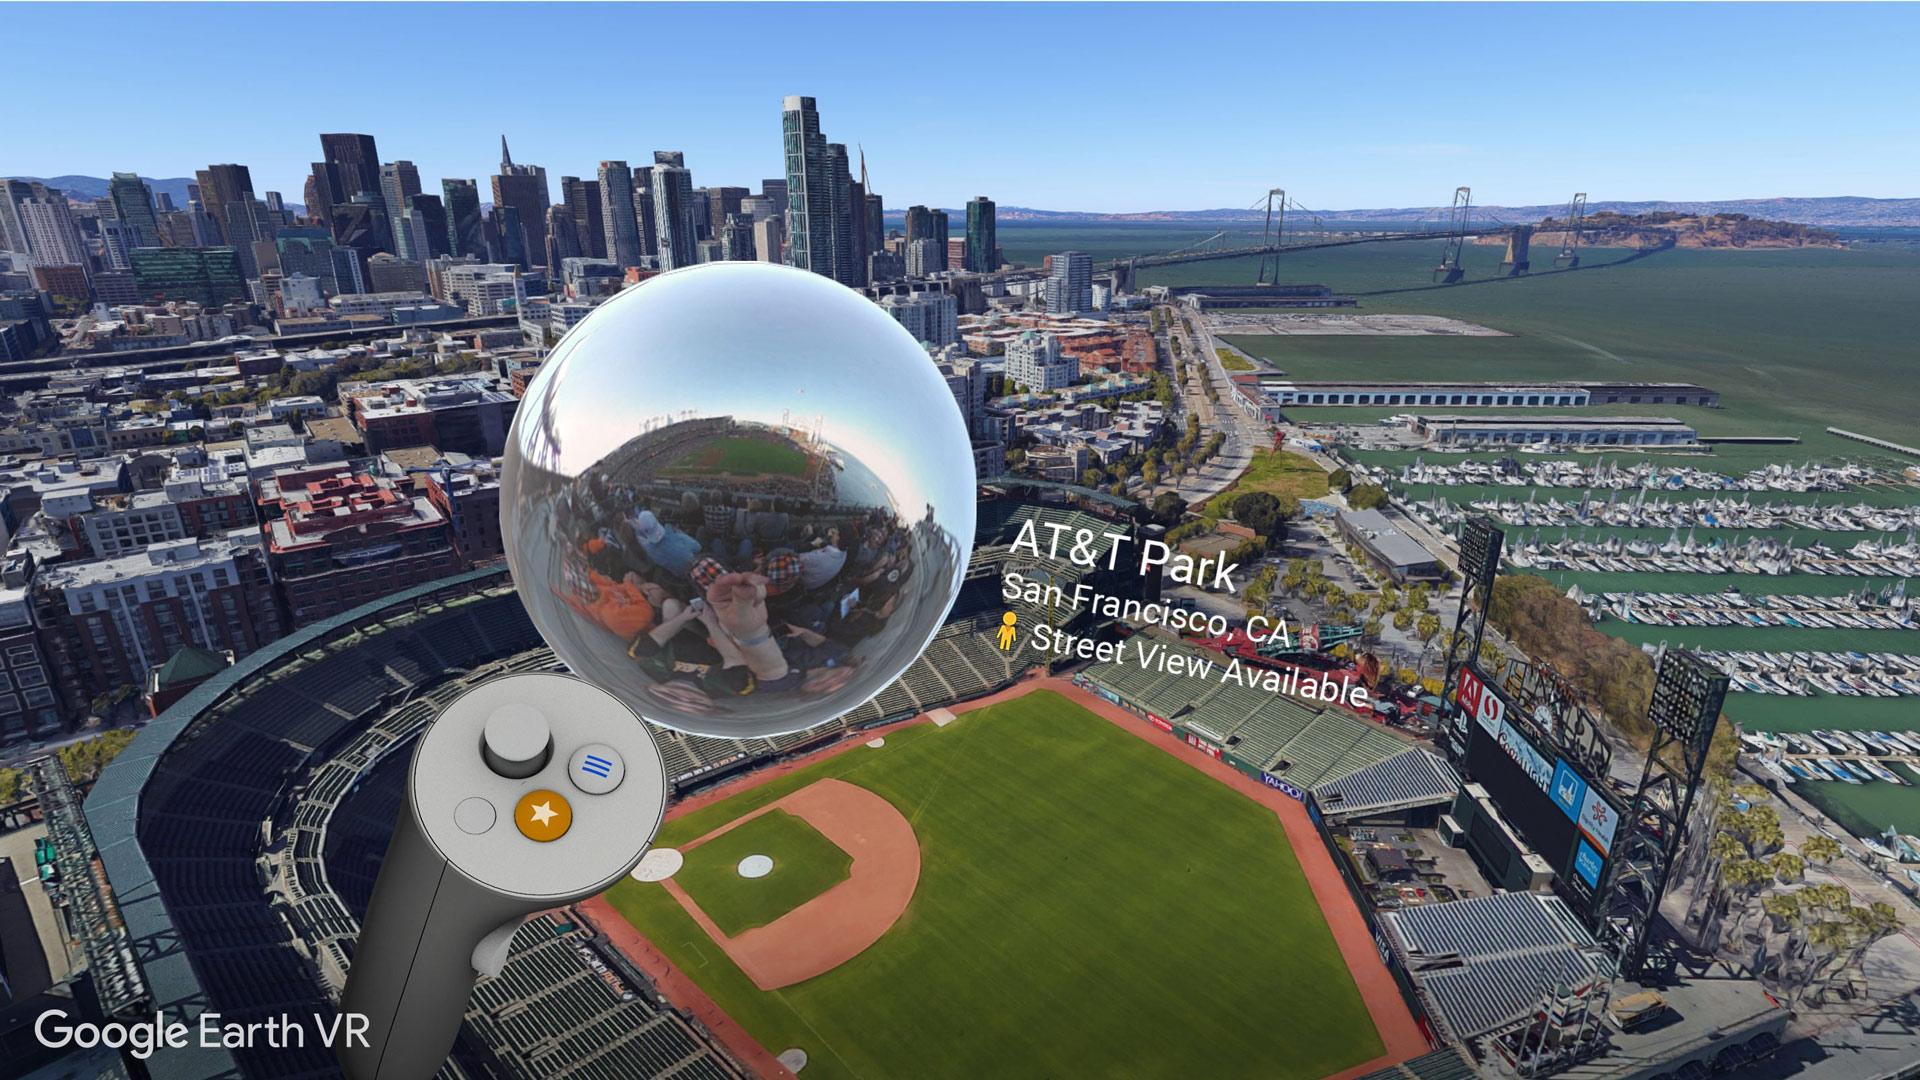 google-earth-vr-street-view.jpg